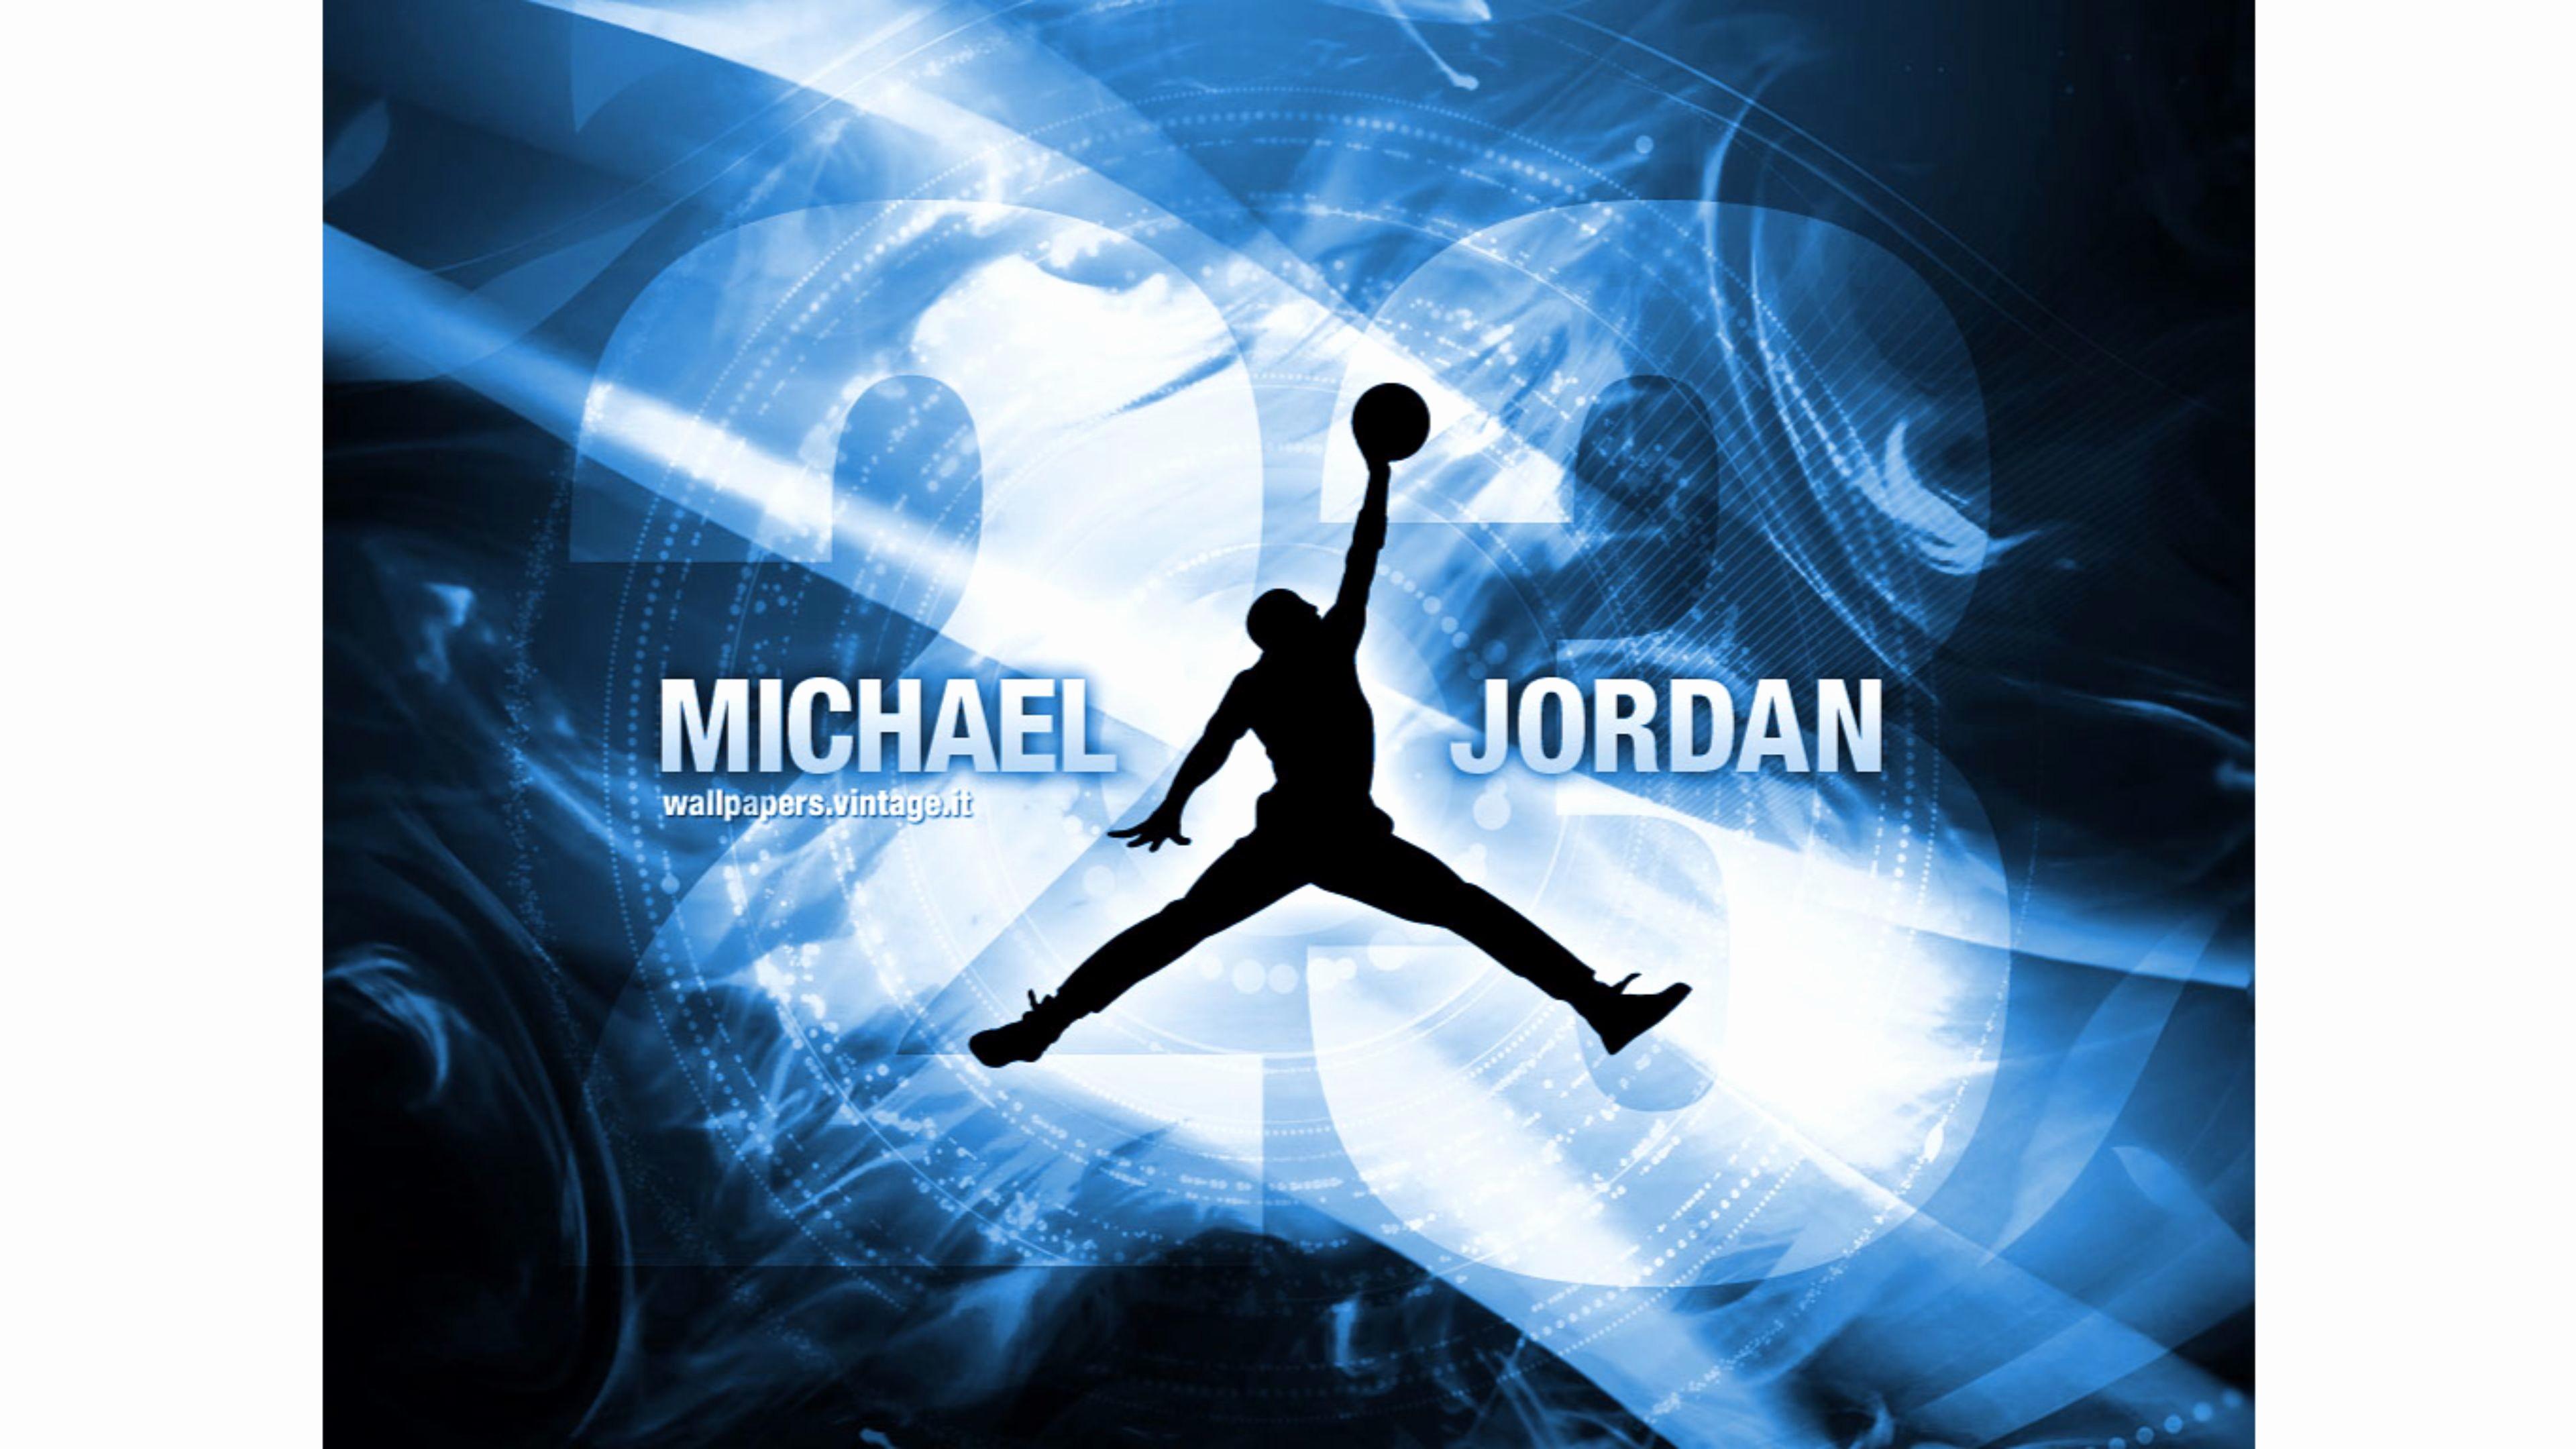 Cool Jordan Logo Wallpaper Cool Nike Backgrounds For 23 Michael Jordan Background 3840x2160 Wallpaper Teahub Io